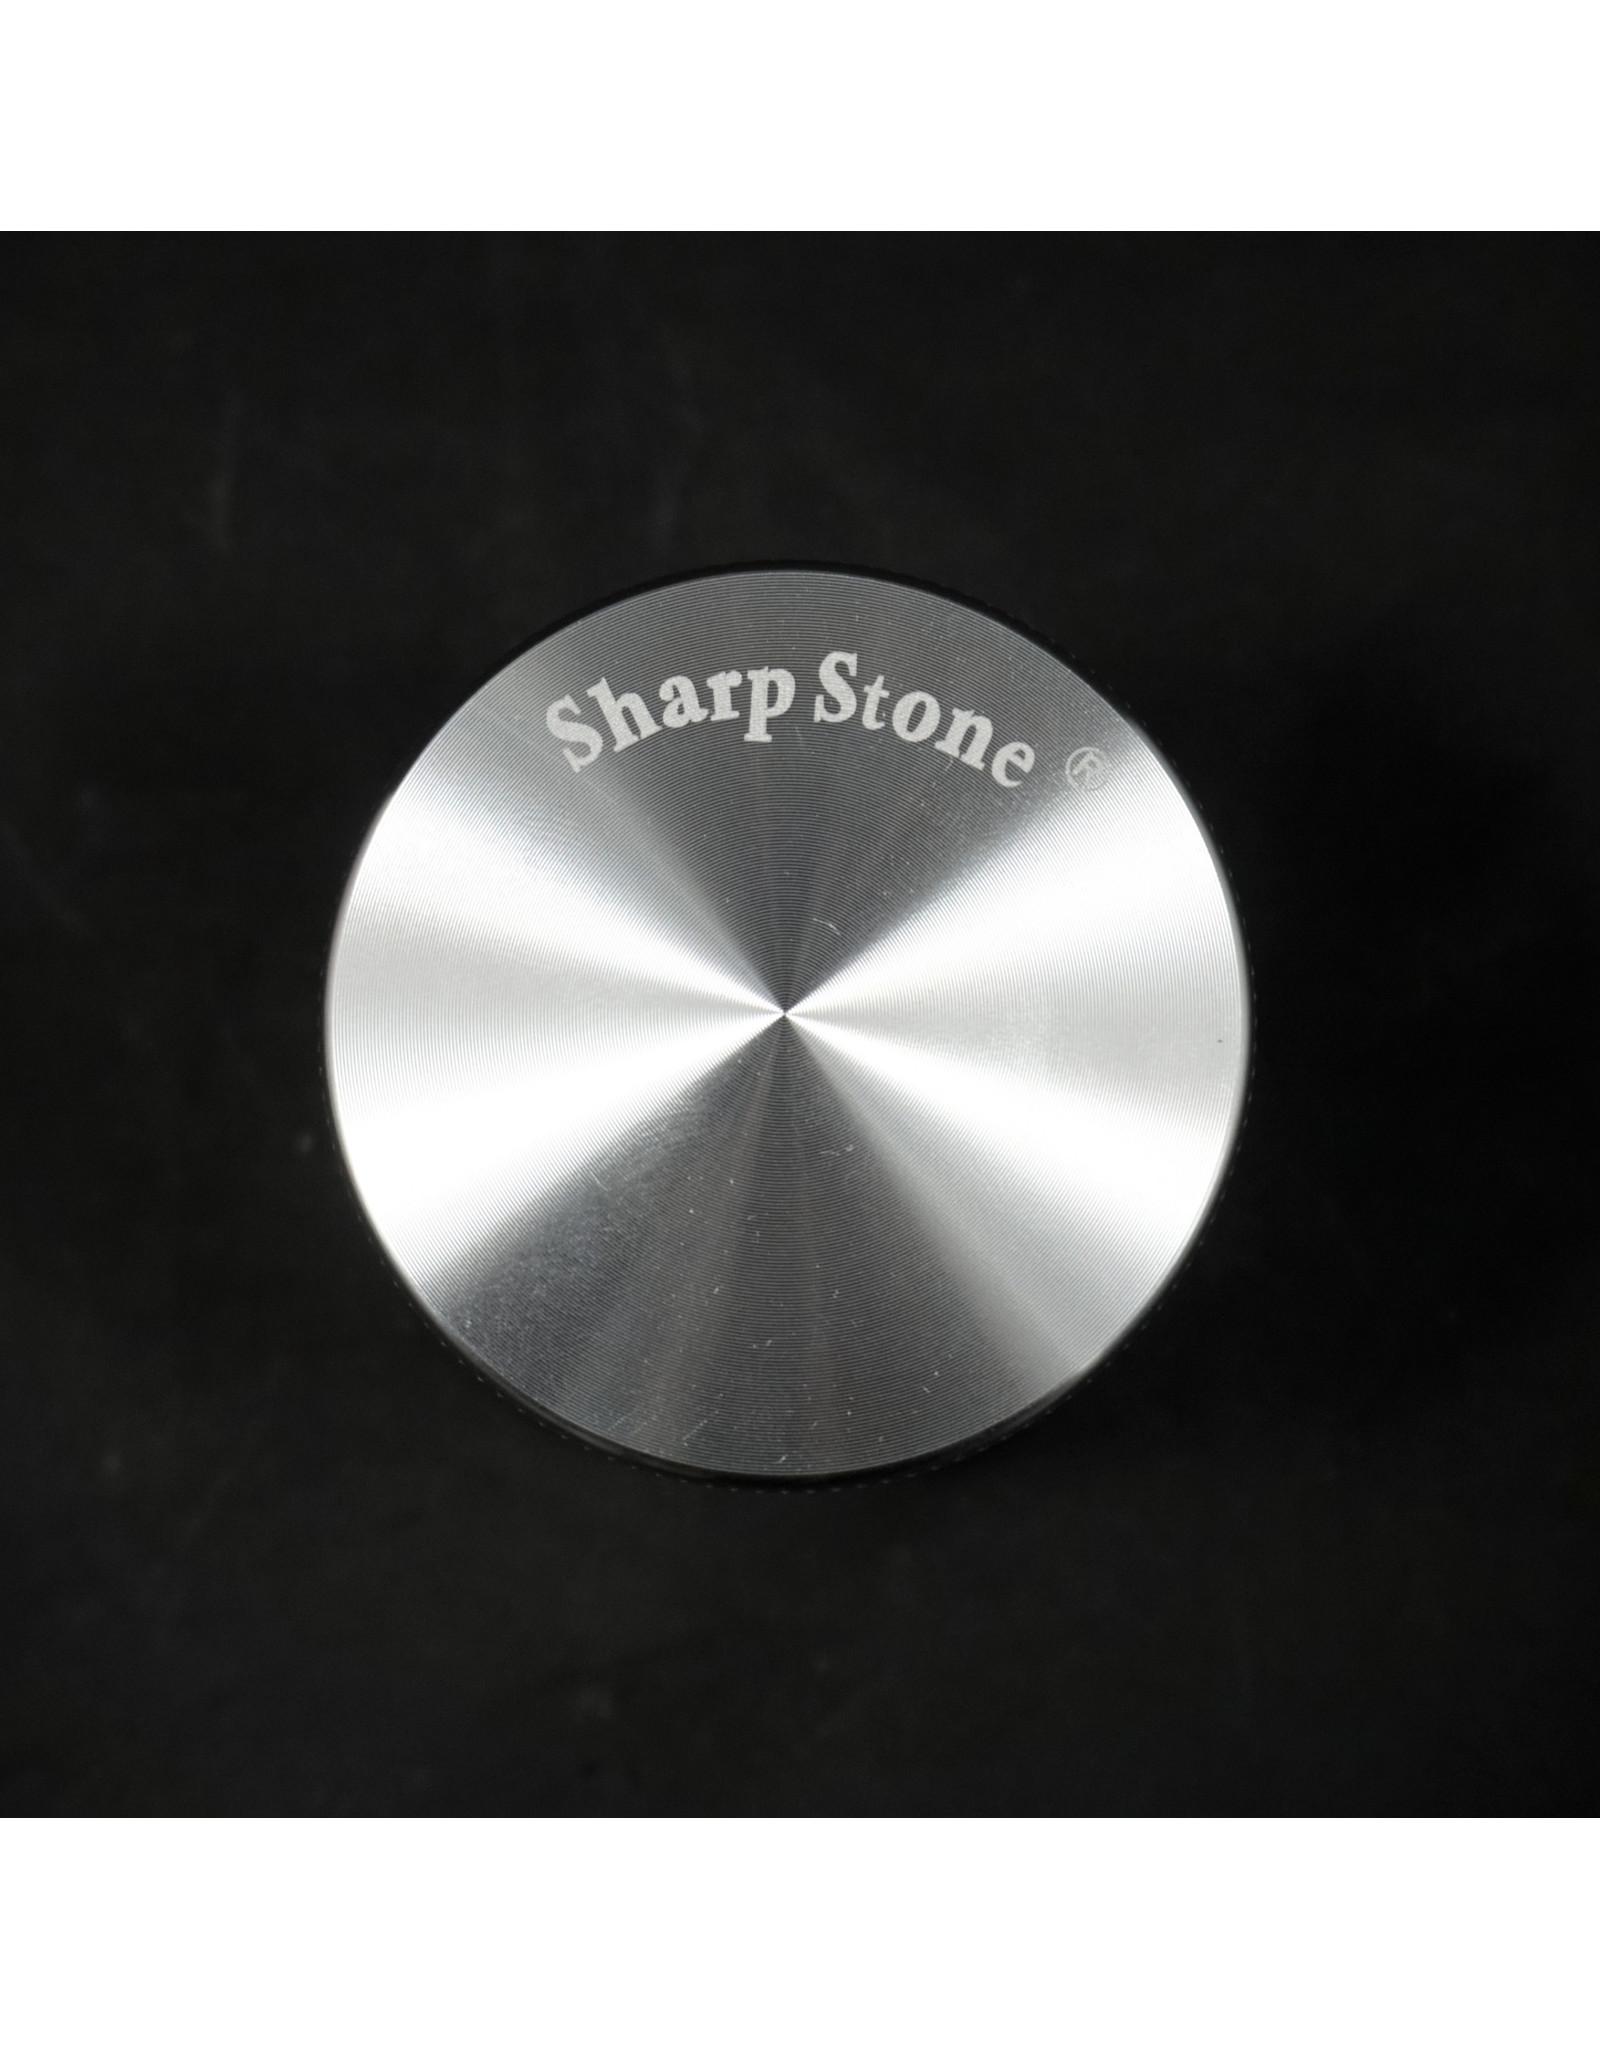 "Sharpstone Sharpstone 2.2"" Vibrating - Silver"